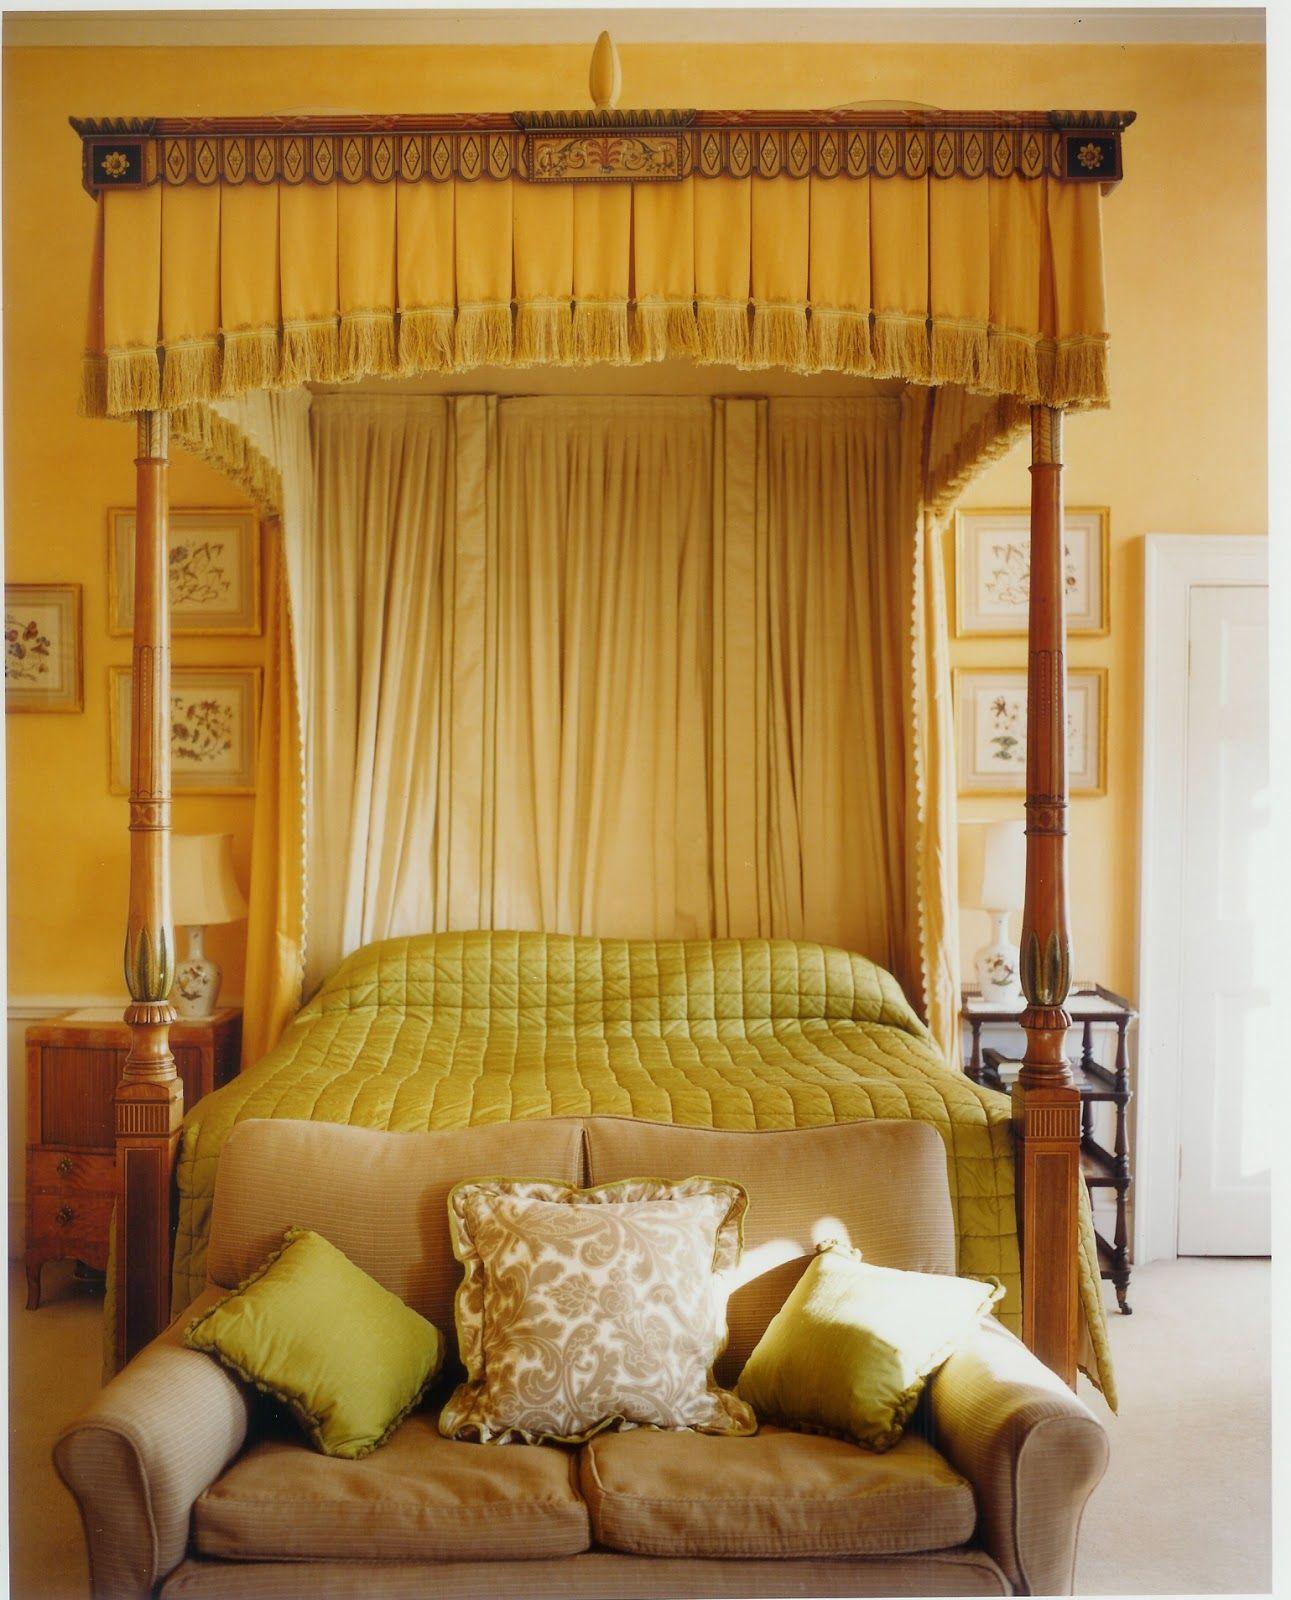 John Fowler Cornbury Park Oxfordshire Home, Yellow